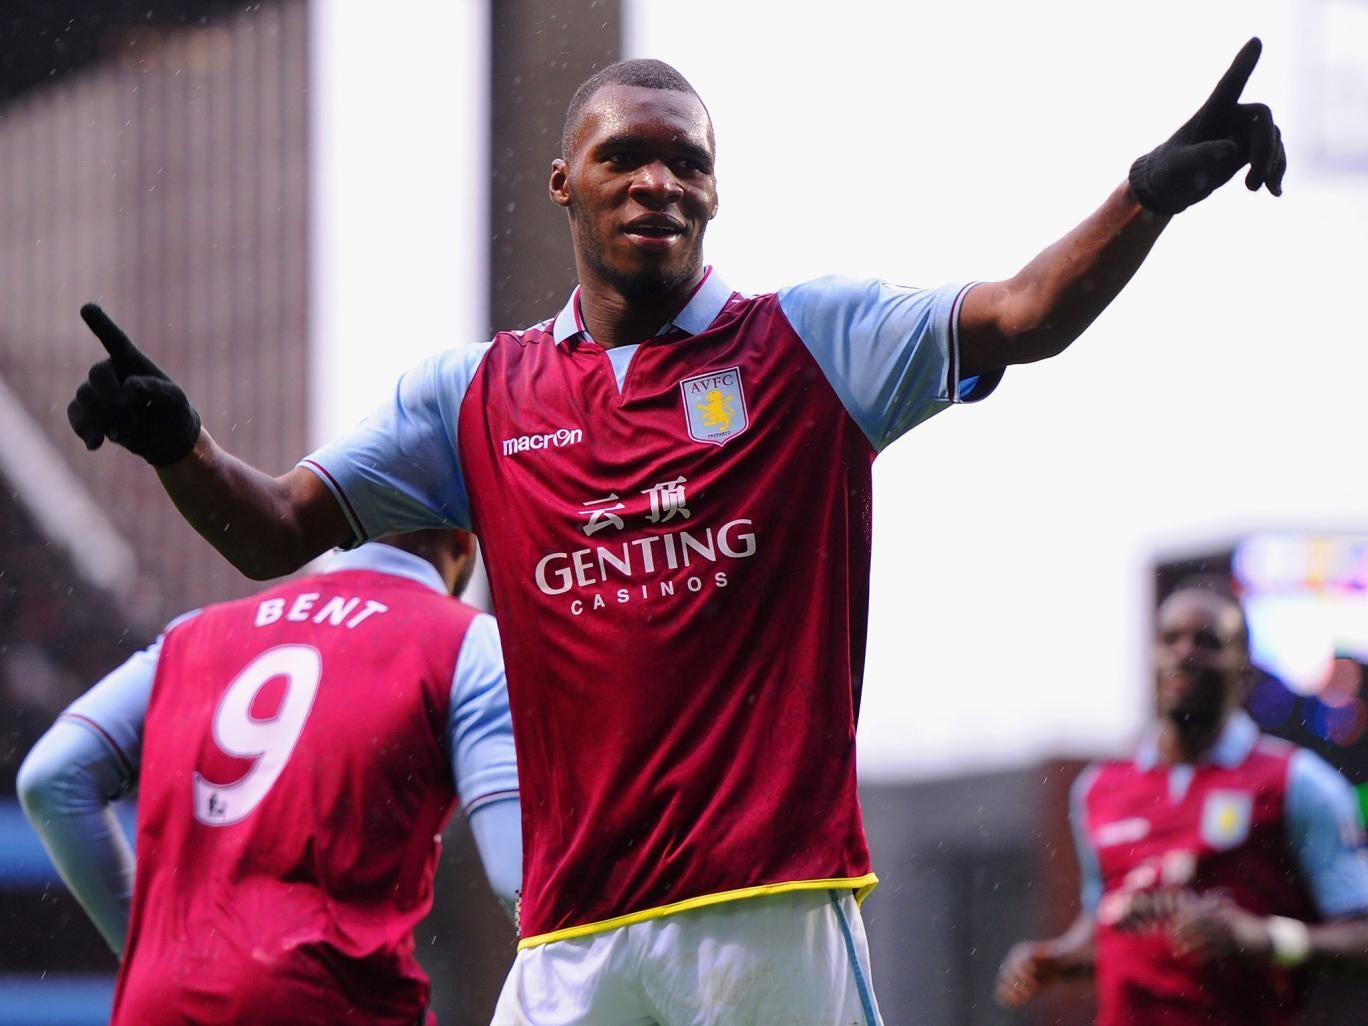 Benteke celebrates his goal for Aston Villa